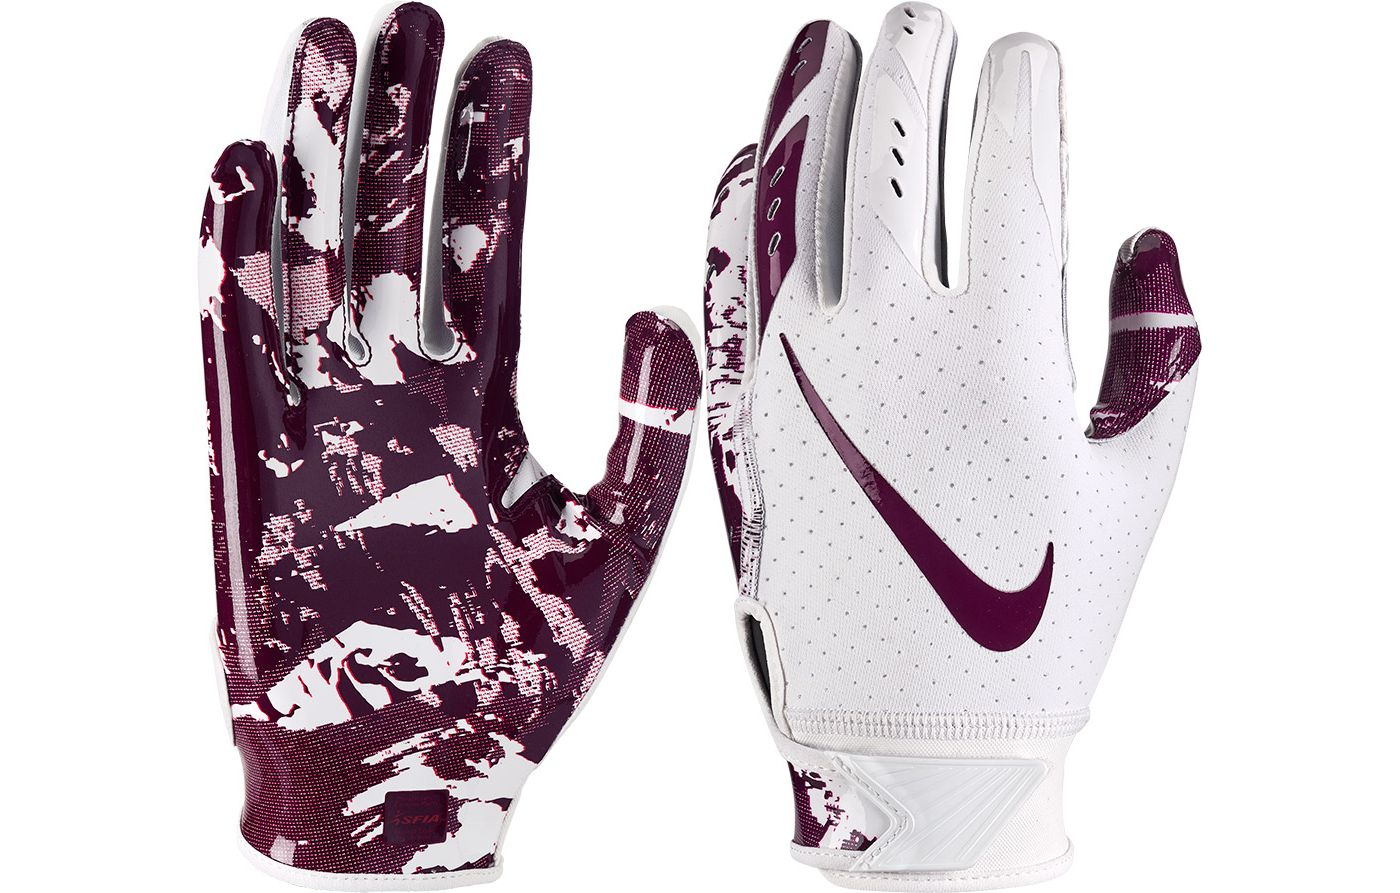 Nike Youth Vapor Jet 5.0 Receiver Gloves